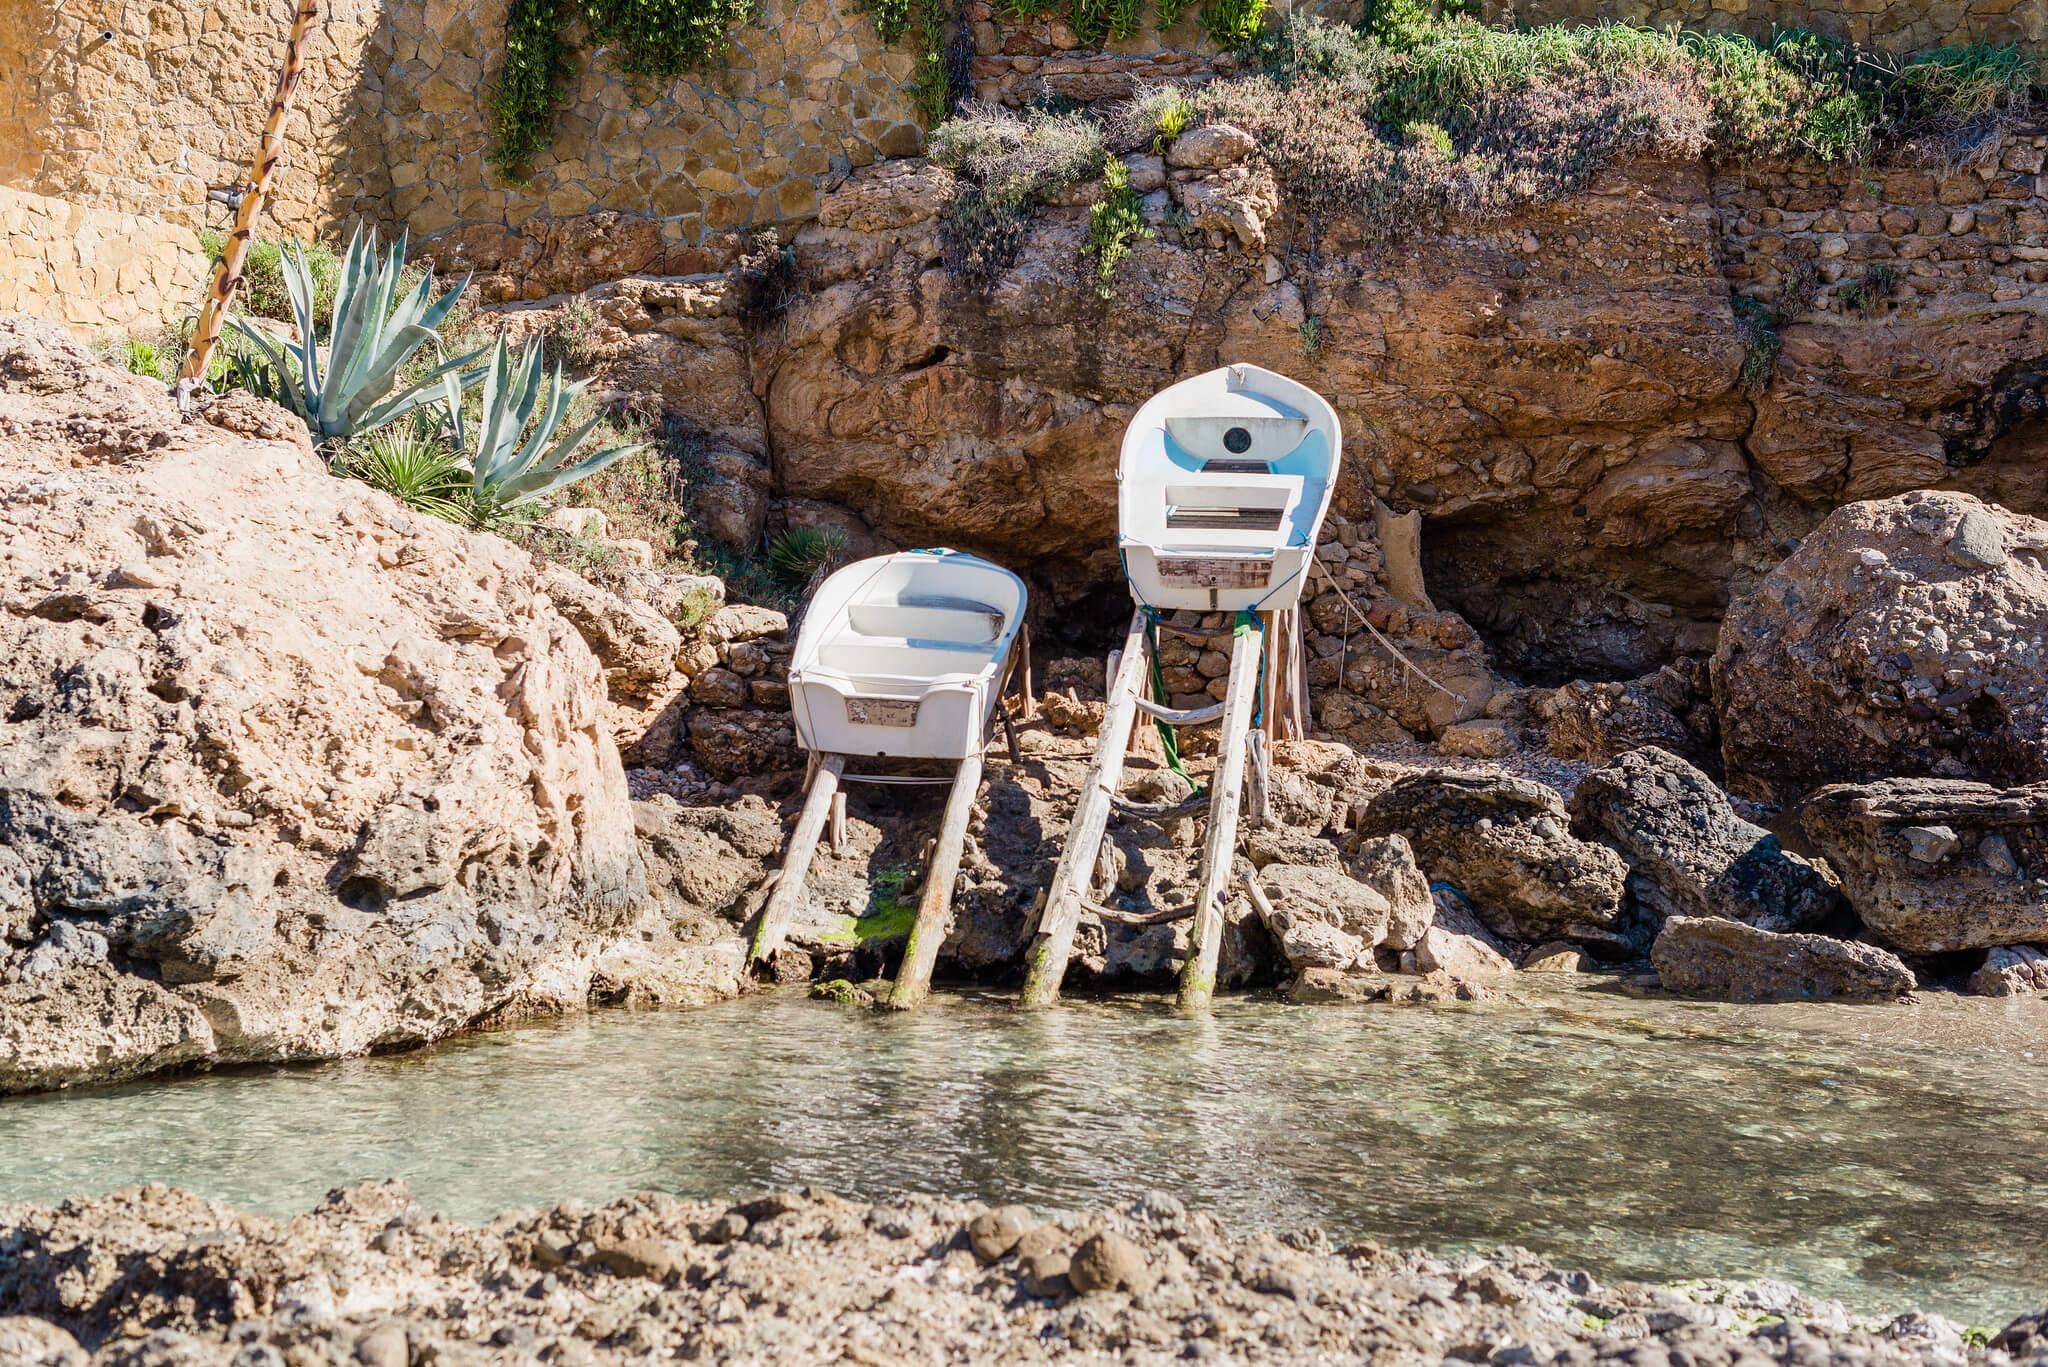 https://www.white-ibiza.com/wp-content/uploads/2020/03/ibiza-beaches-cala-xaracca-06.jpg